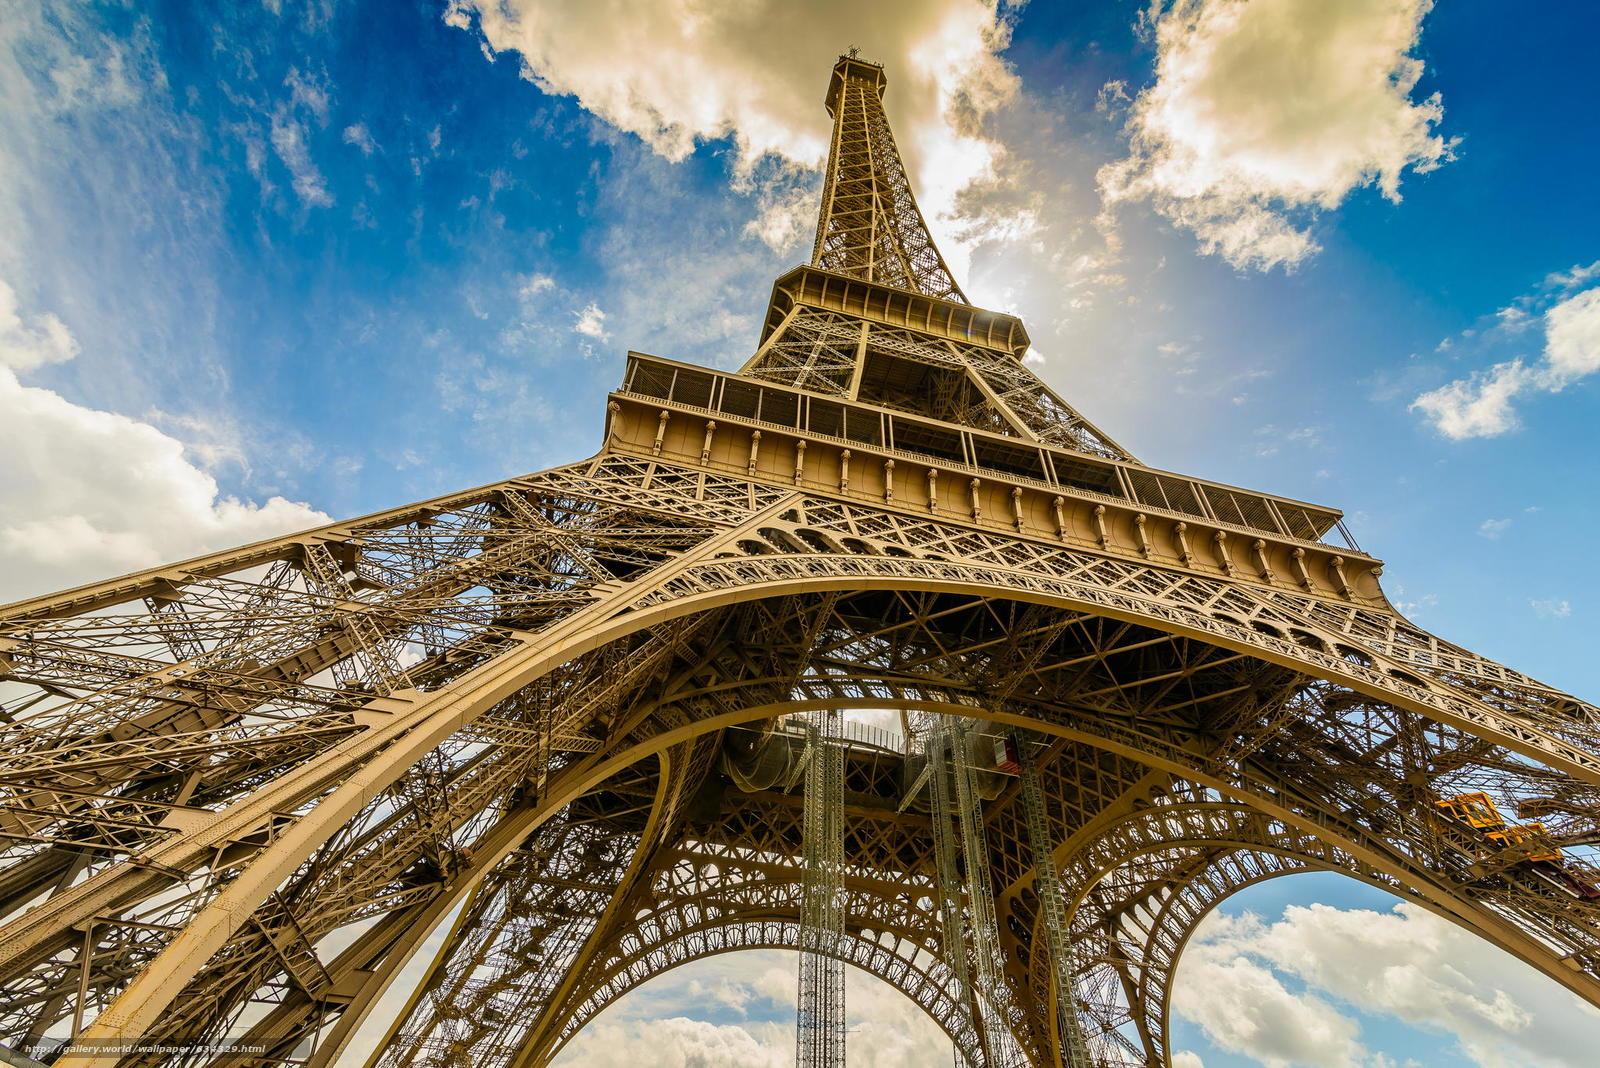 Download Wallpaper Eiffel Tower Paris France Free